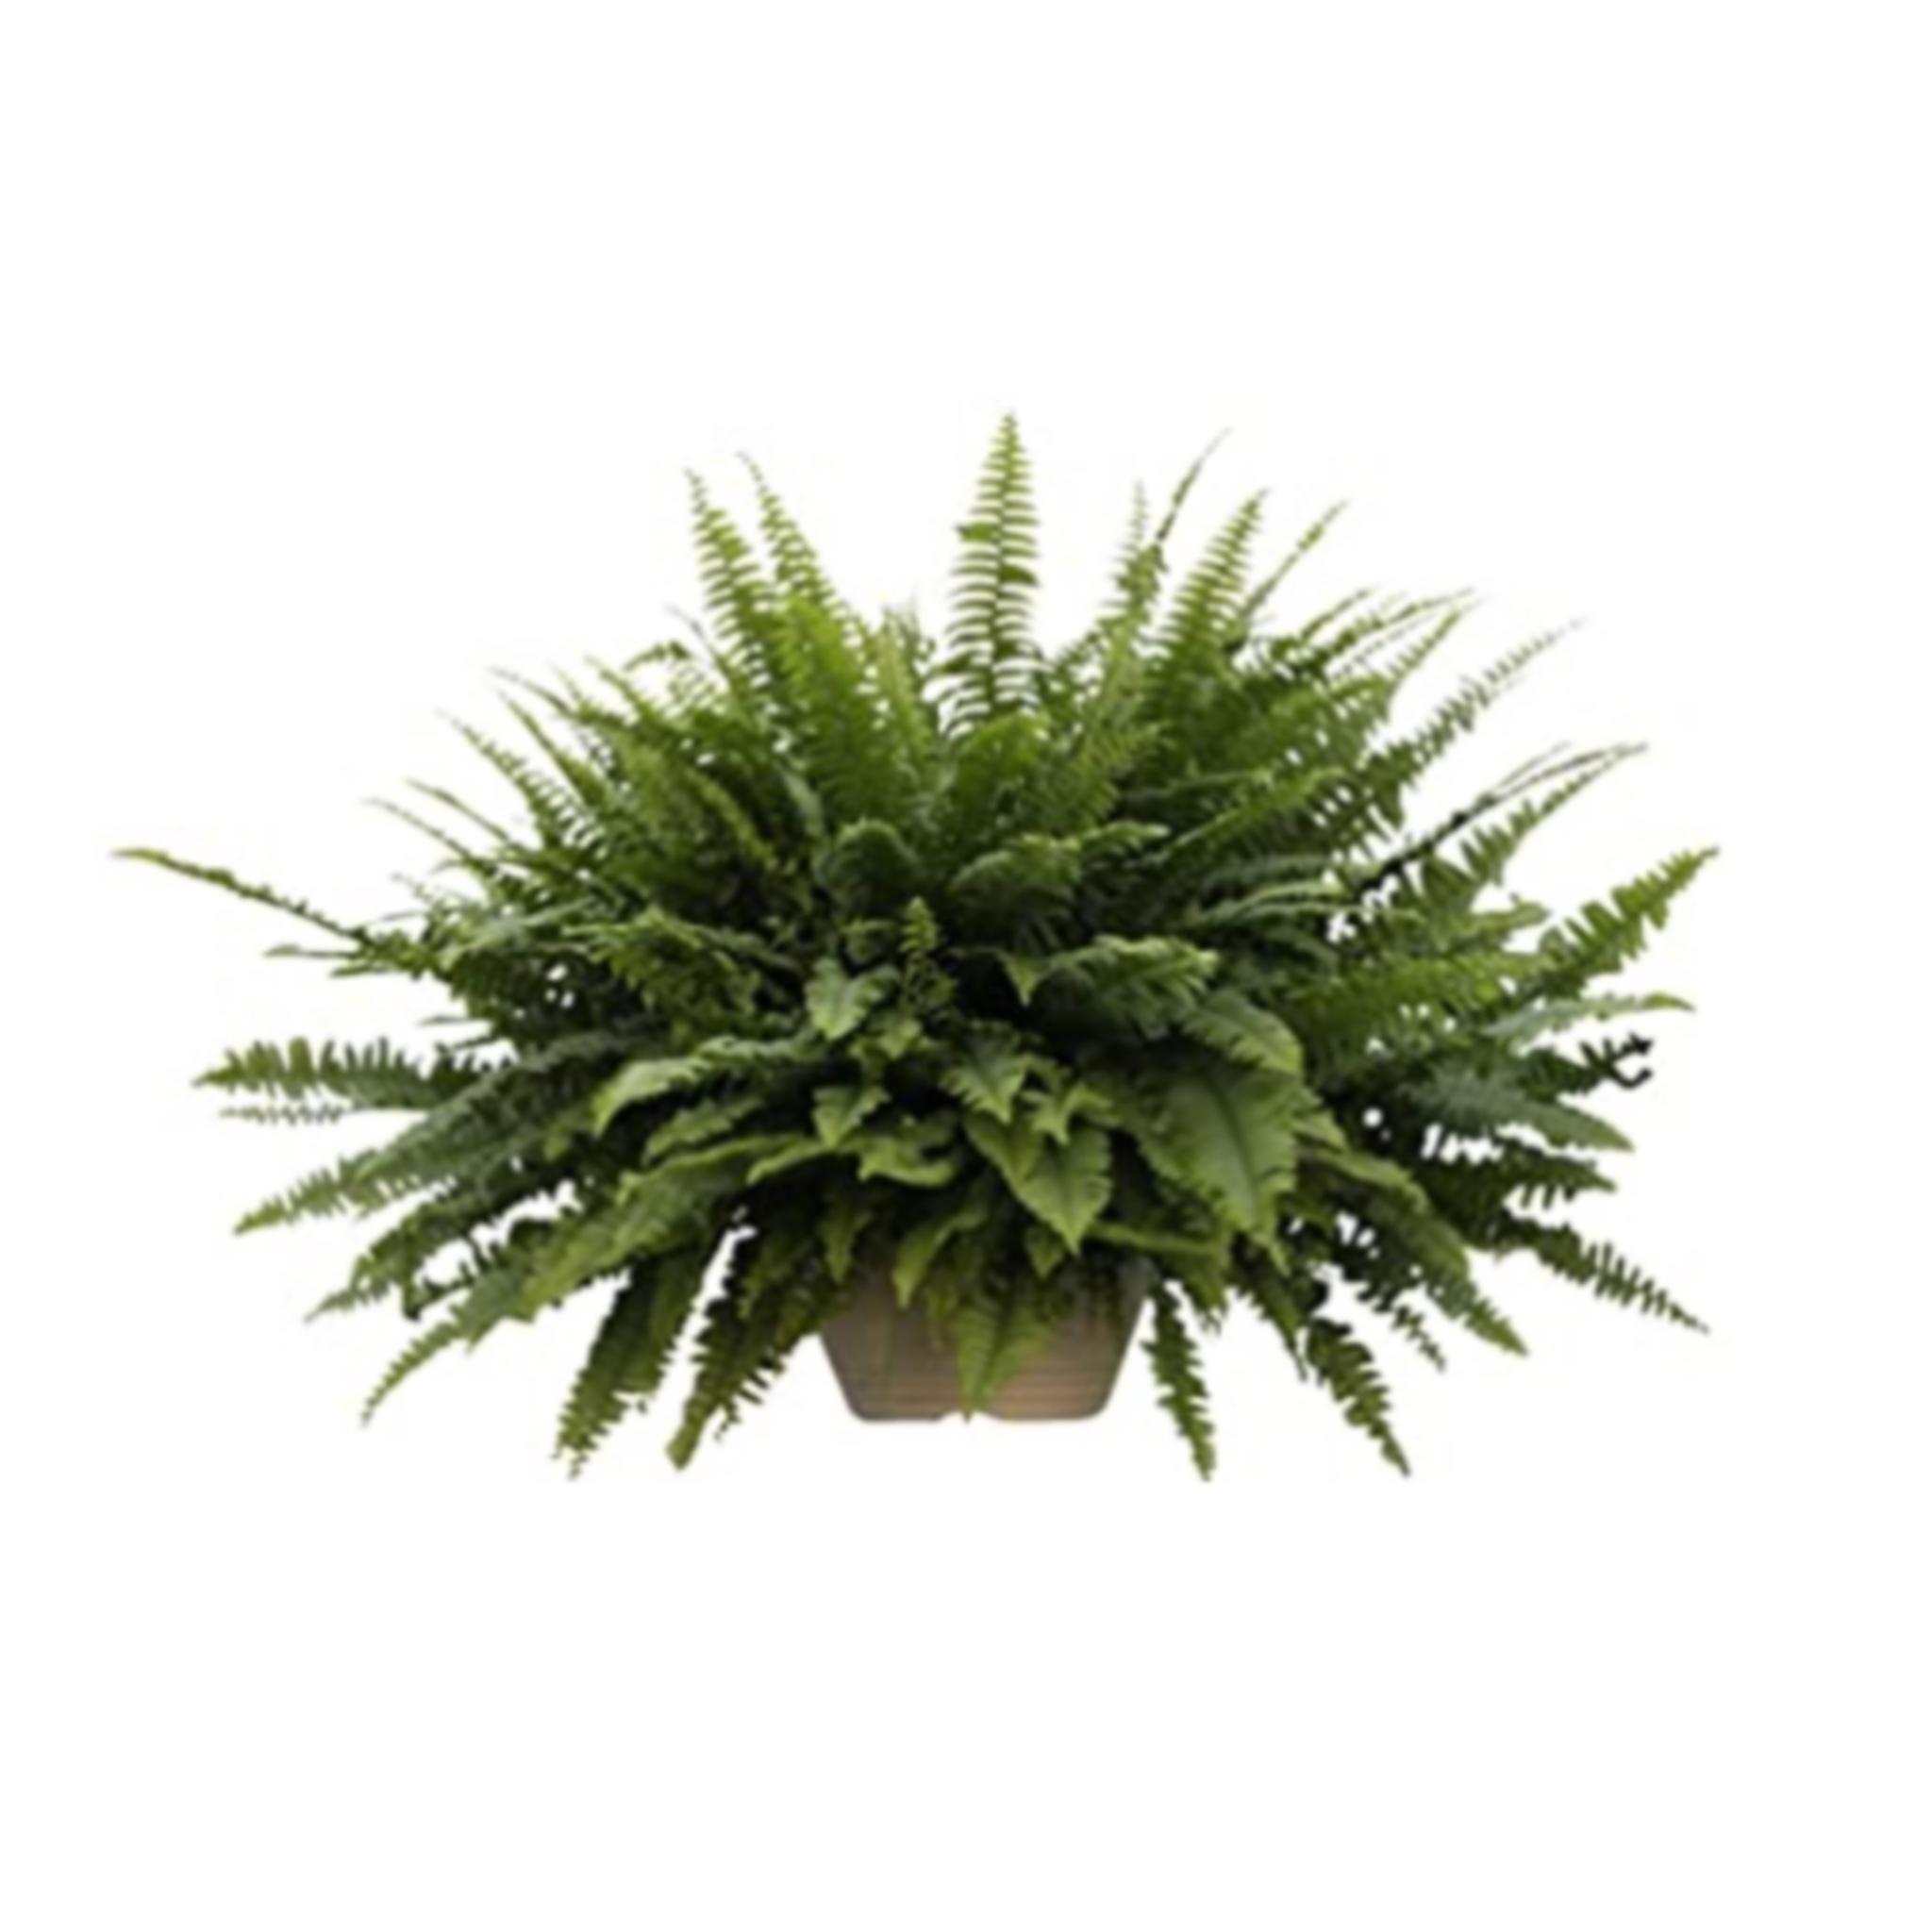 Green fern hanging plant